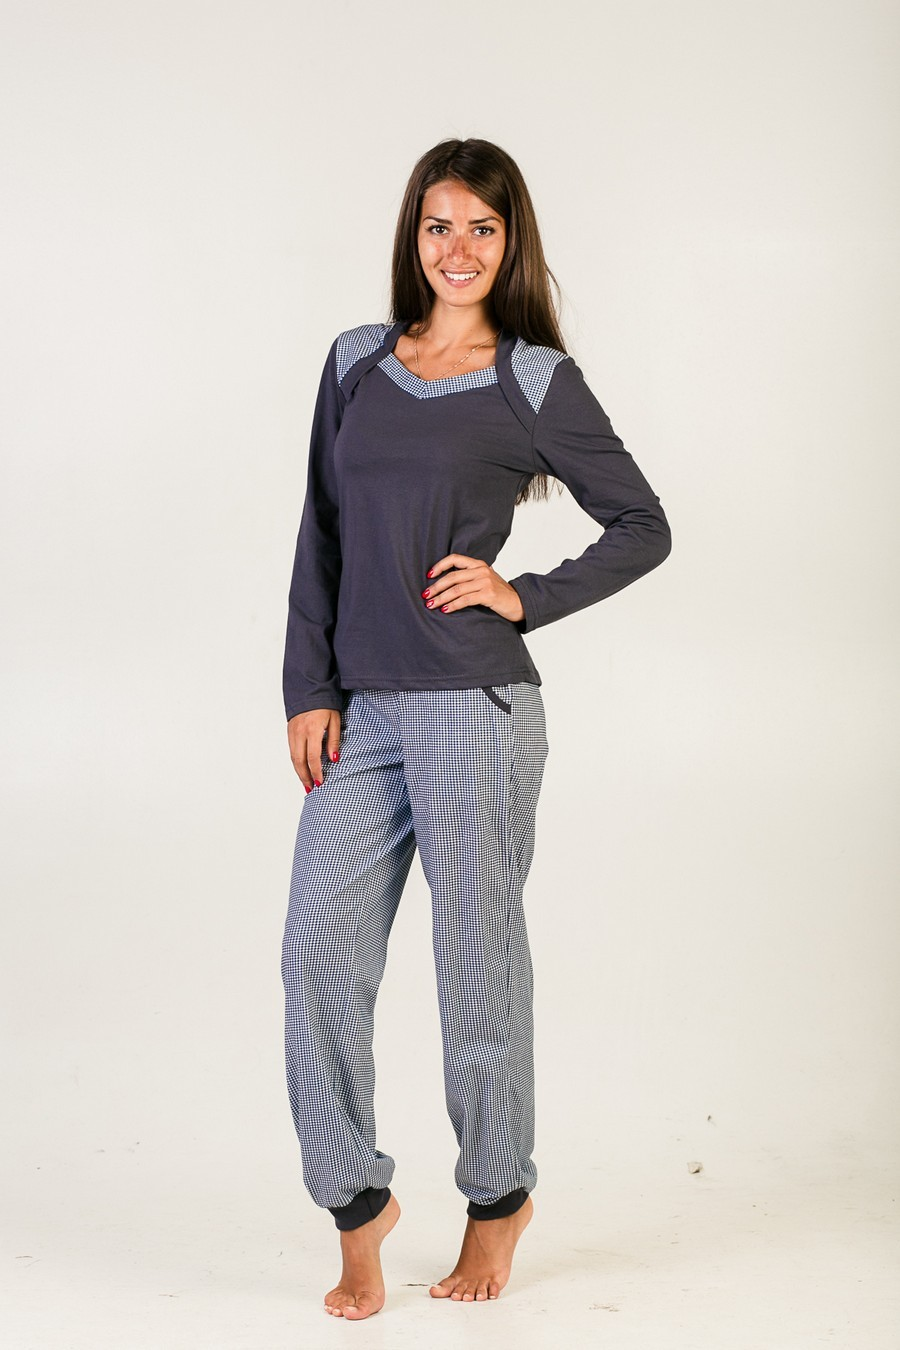 Комплект Меланж Клетка (блузка+брюки)Коллекция ОСЕНЬ-ЗИМА<br><br><br>Размер: 50